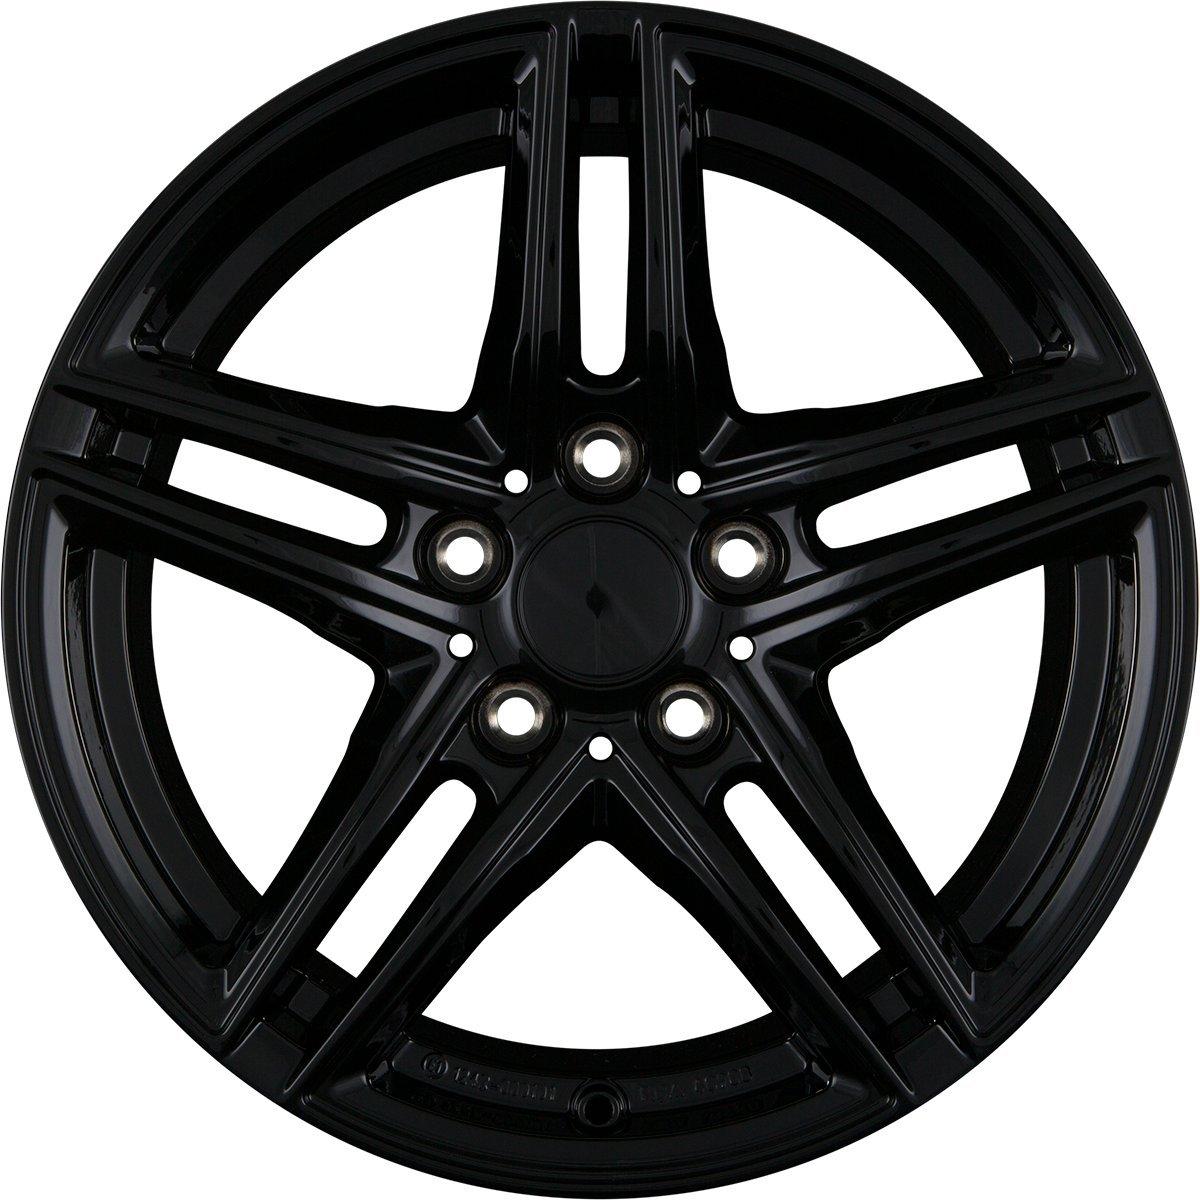 Borbet XR black glossy 7, 5x17 ET35 5.00x120 Hub Bore 72.50 mm - Alu felgen